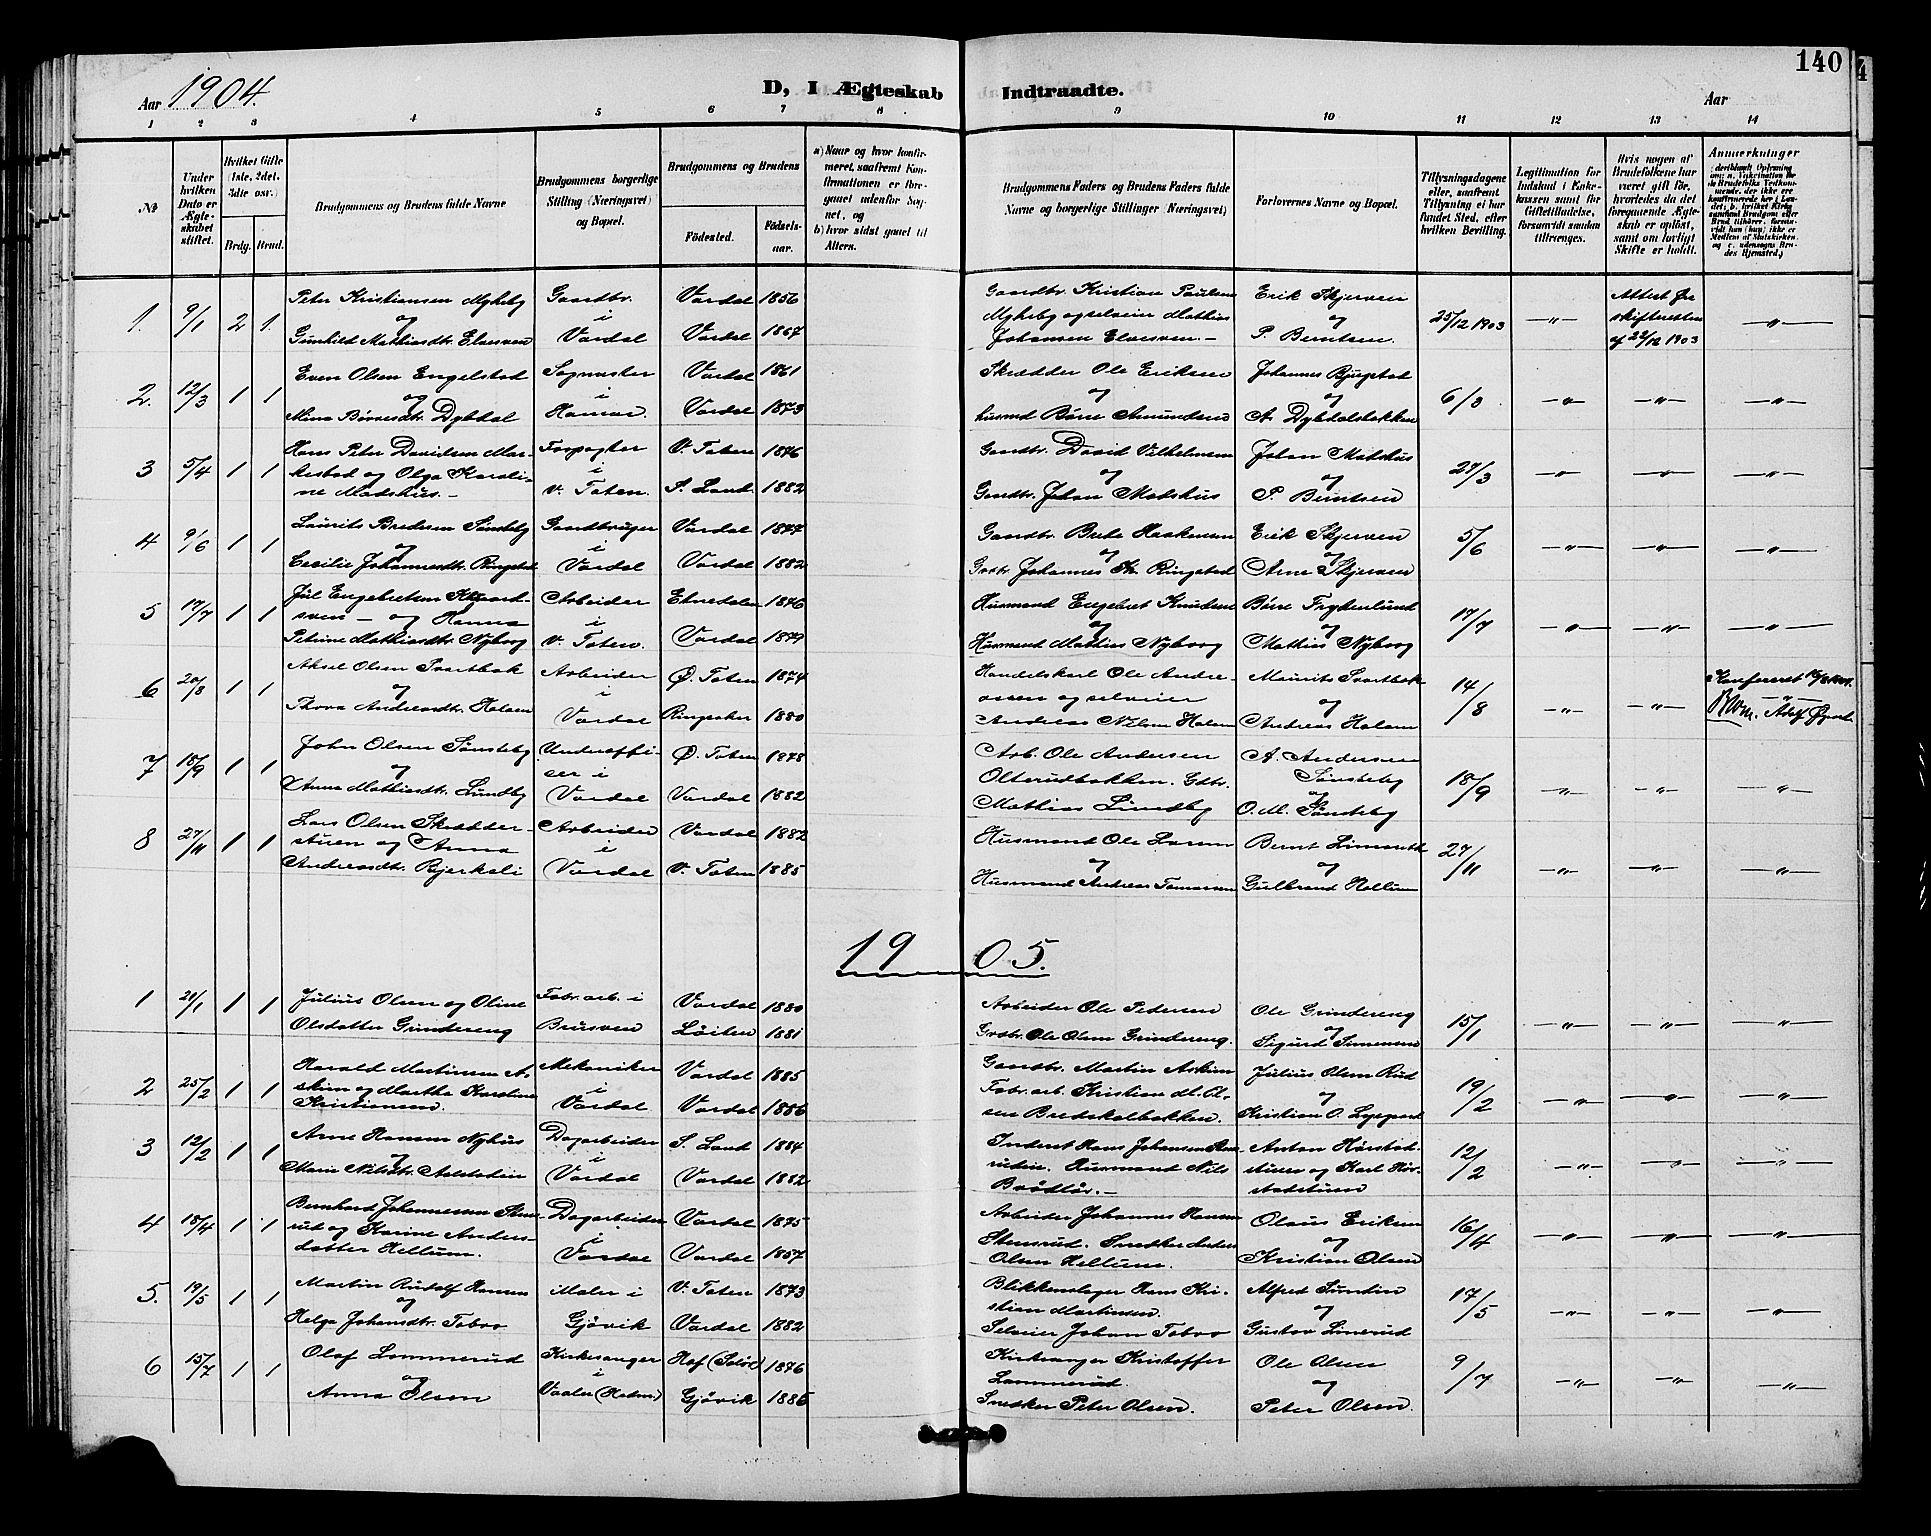 SAH, Vardal prestekontor, H/Ha/Hab/L0011: Klokkerbok nr. 11, 1899-1913, s. 140